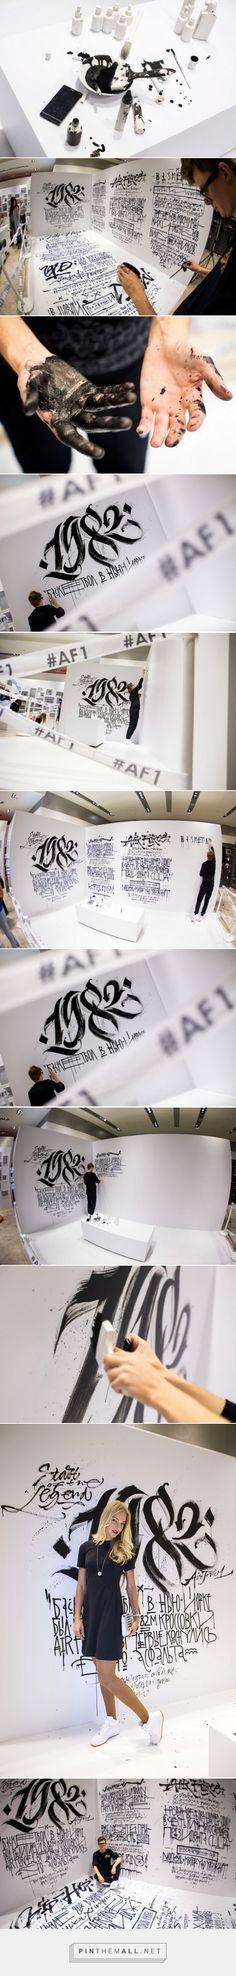 Pokras Lampas & Nike | NiceFuckingGraphics!